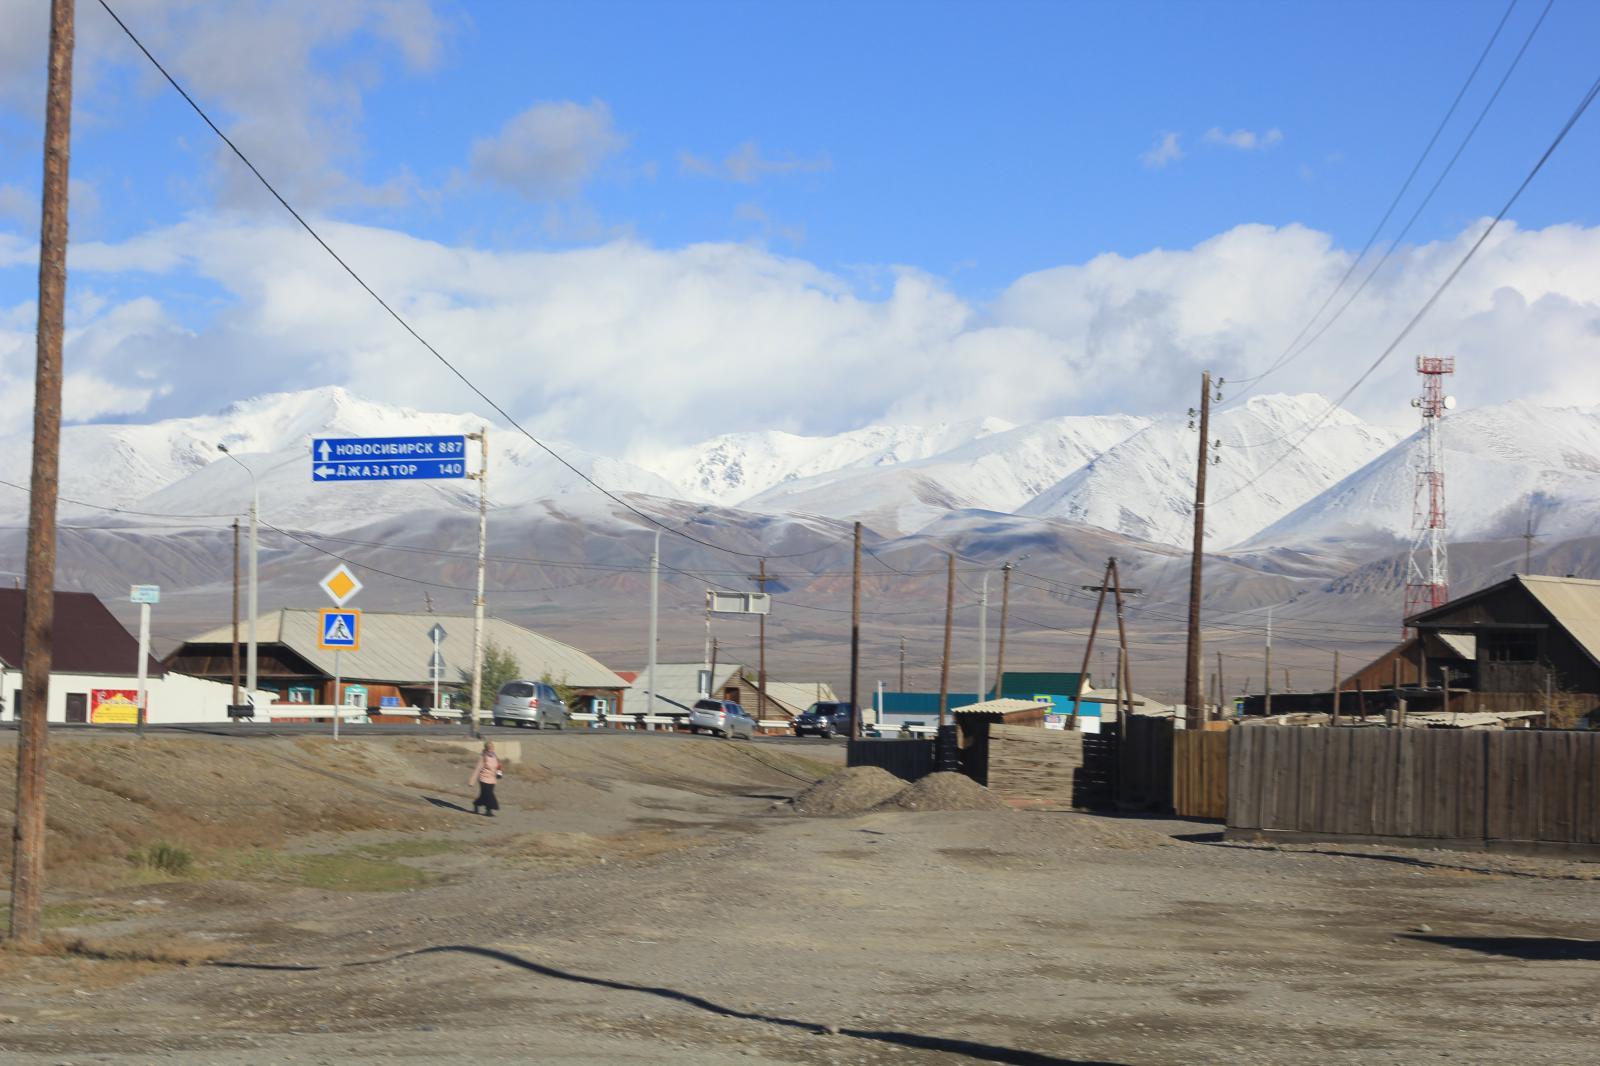 Кош-Агач со всех сторон окружен заснеженными горами. На картинке начало сентября) - IMG_2795.JPG